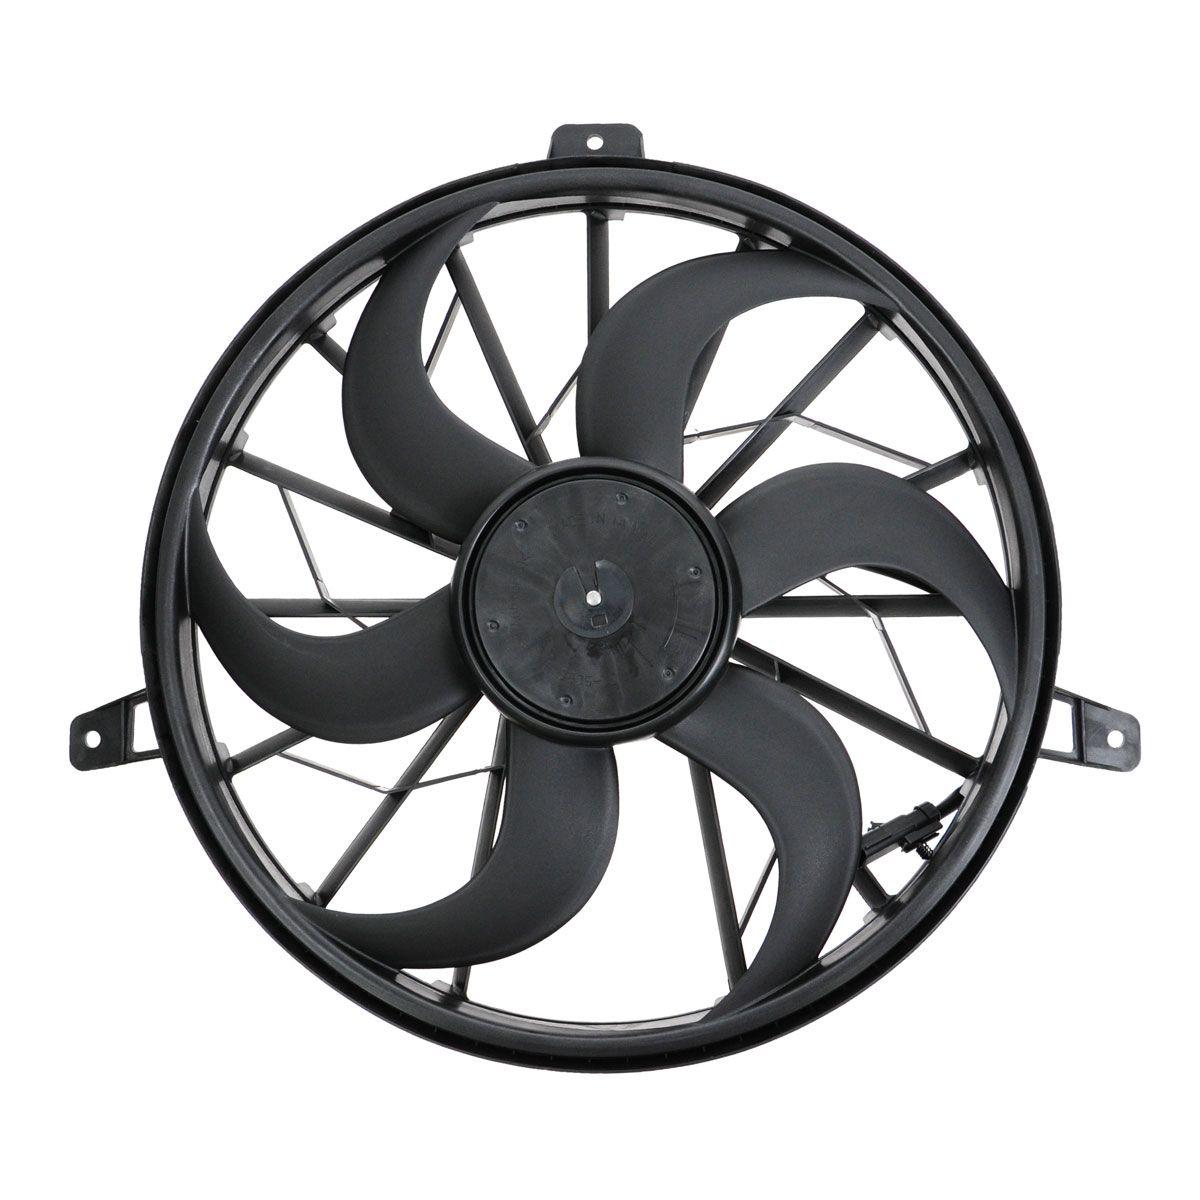 Radiator cooling fan motor assembly for 99 03 jeep grand for Radiator fan motor price